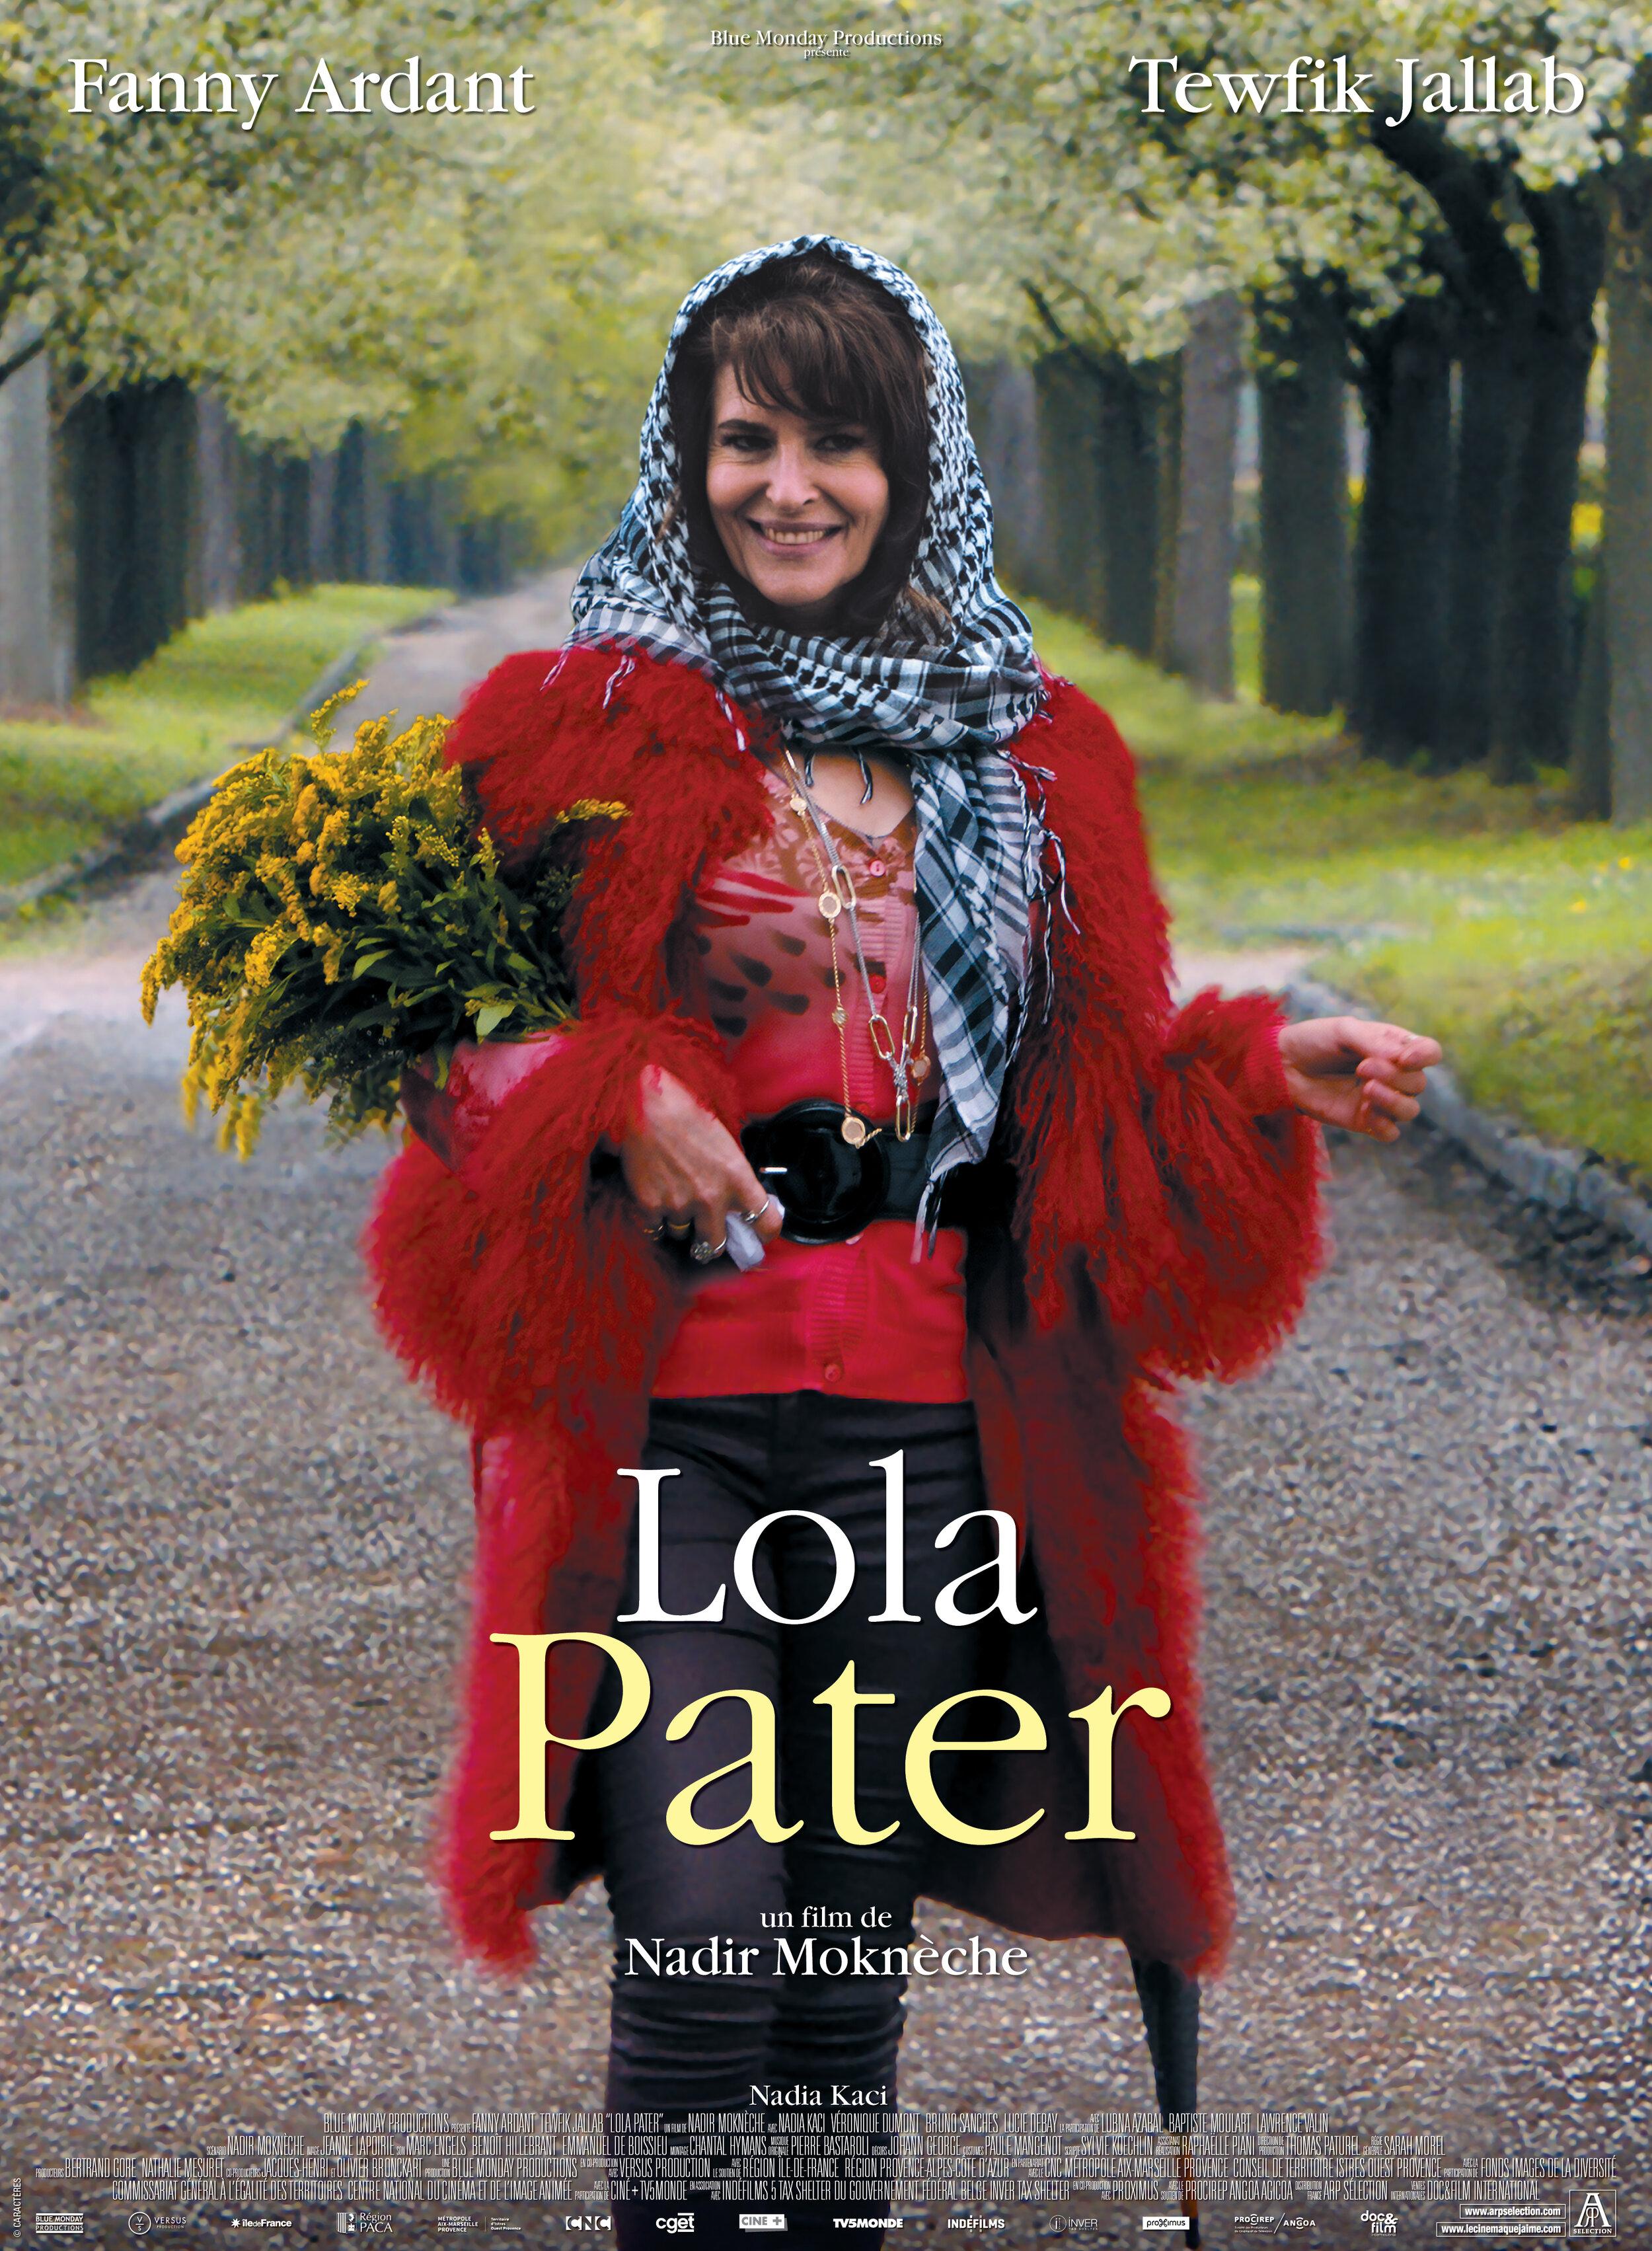 LolaPaterPoster.jpg